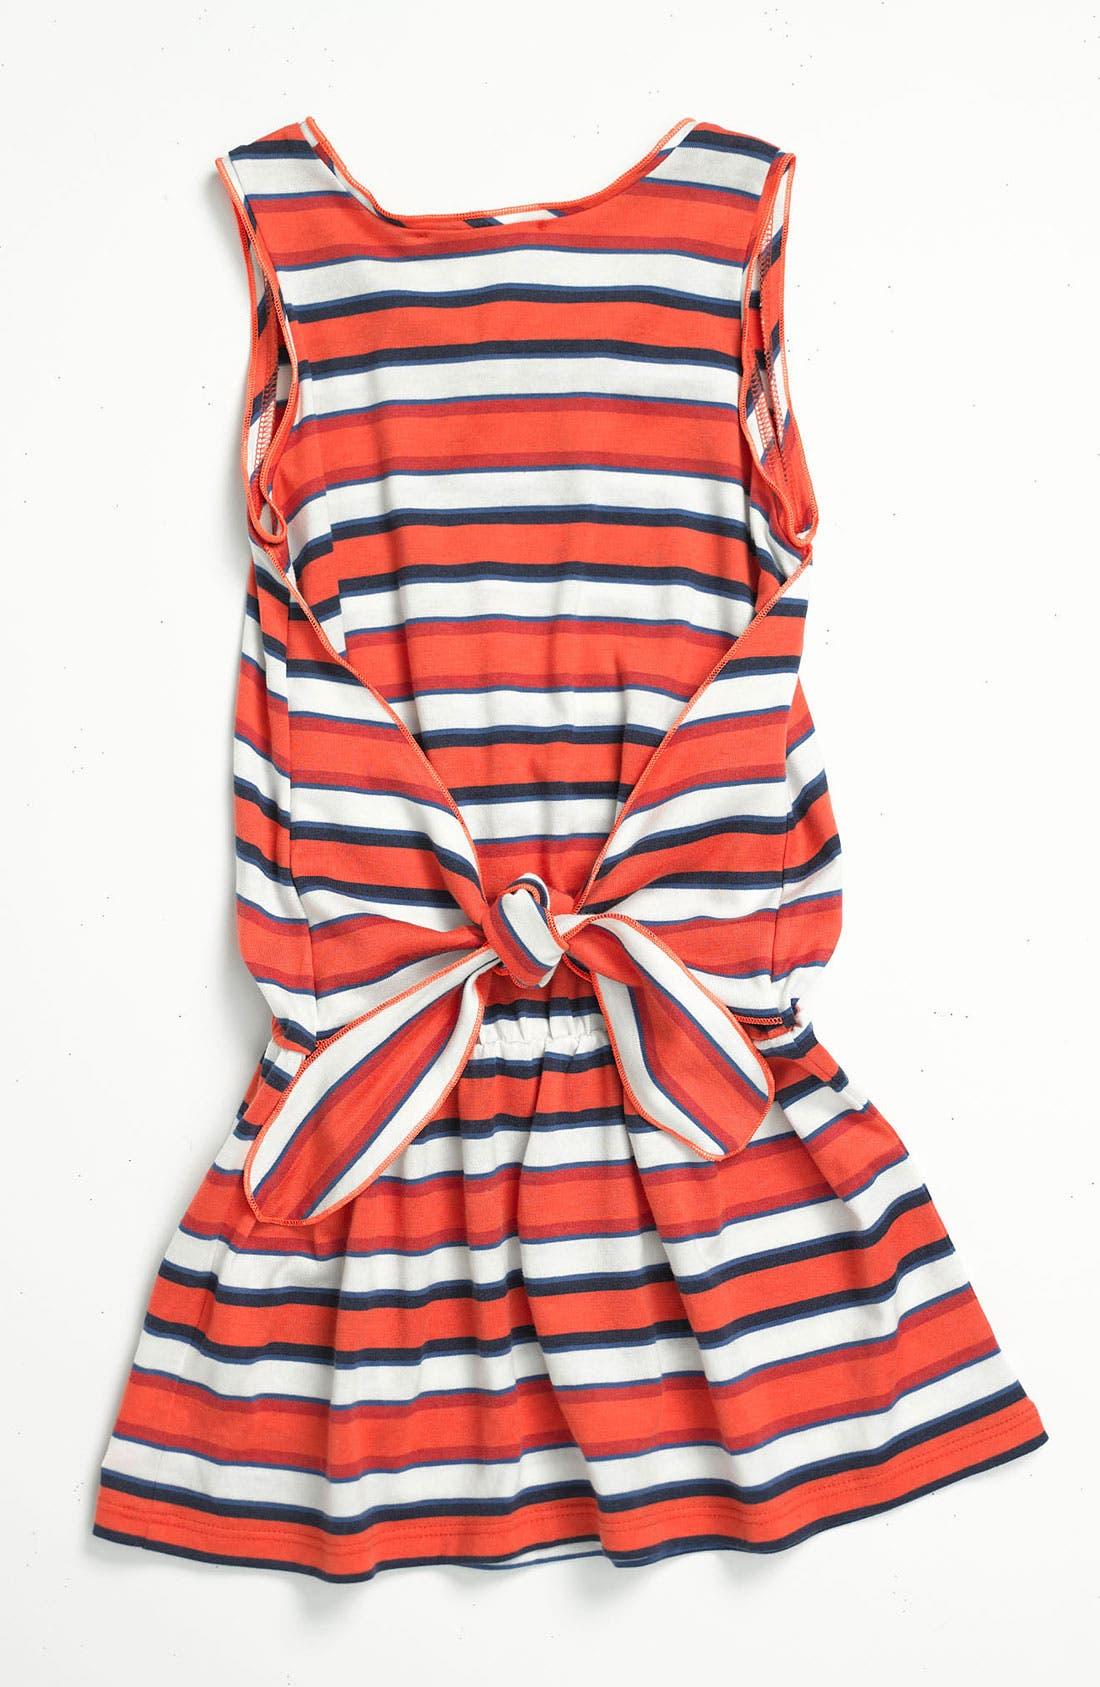 Alternate Image 1 Selected - LITTLE MARC JACOBS Sleeveless Dress (Little Girls & Big Girls)